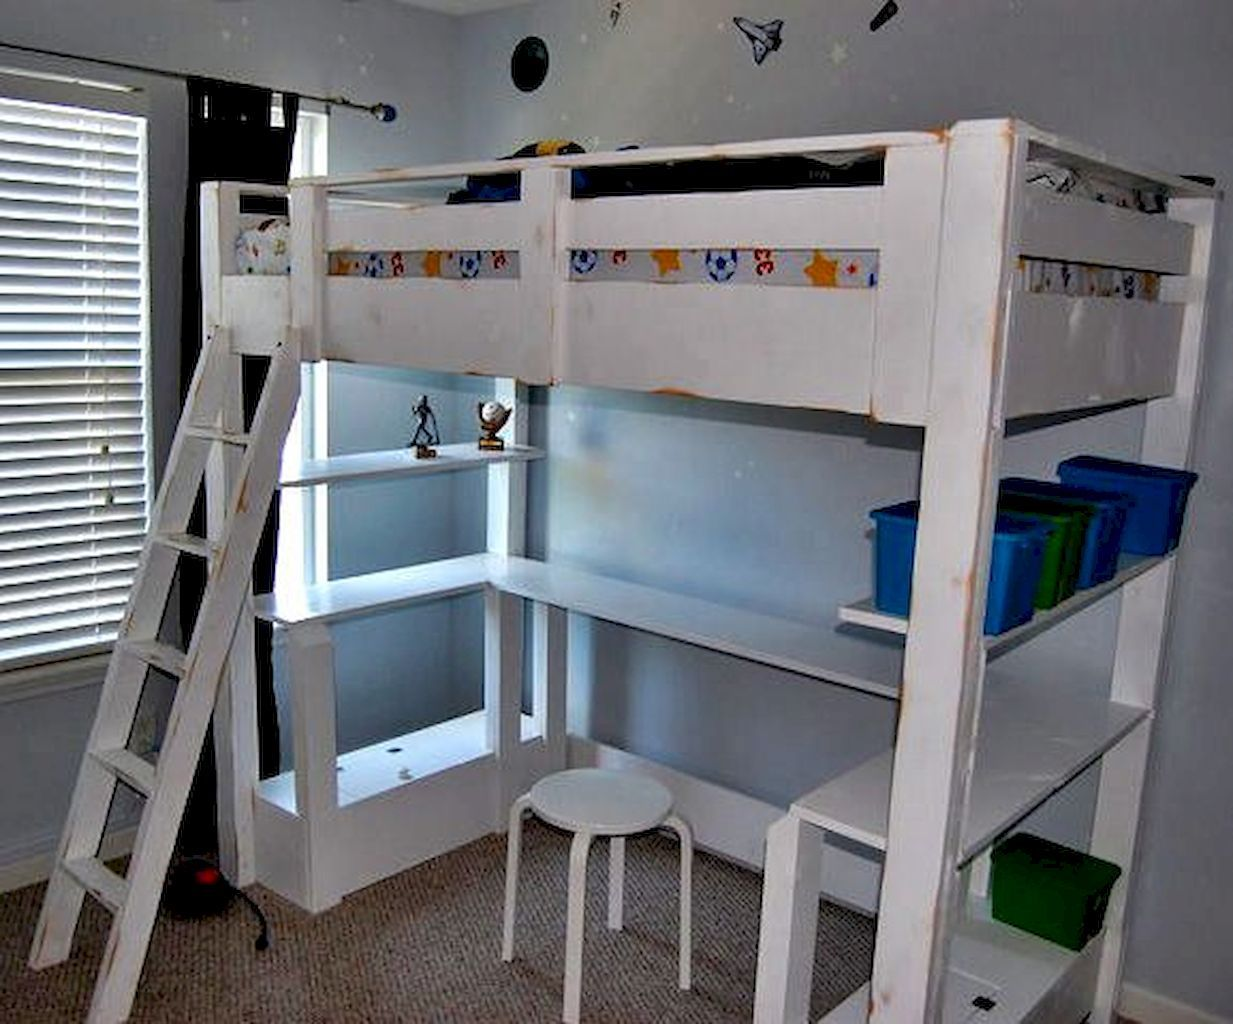 Pin by Kayla on College Build a loft bed, Loft bed desk